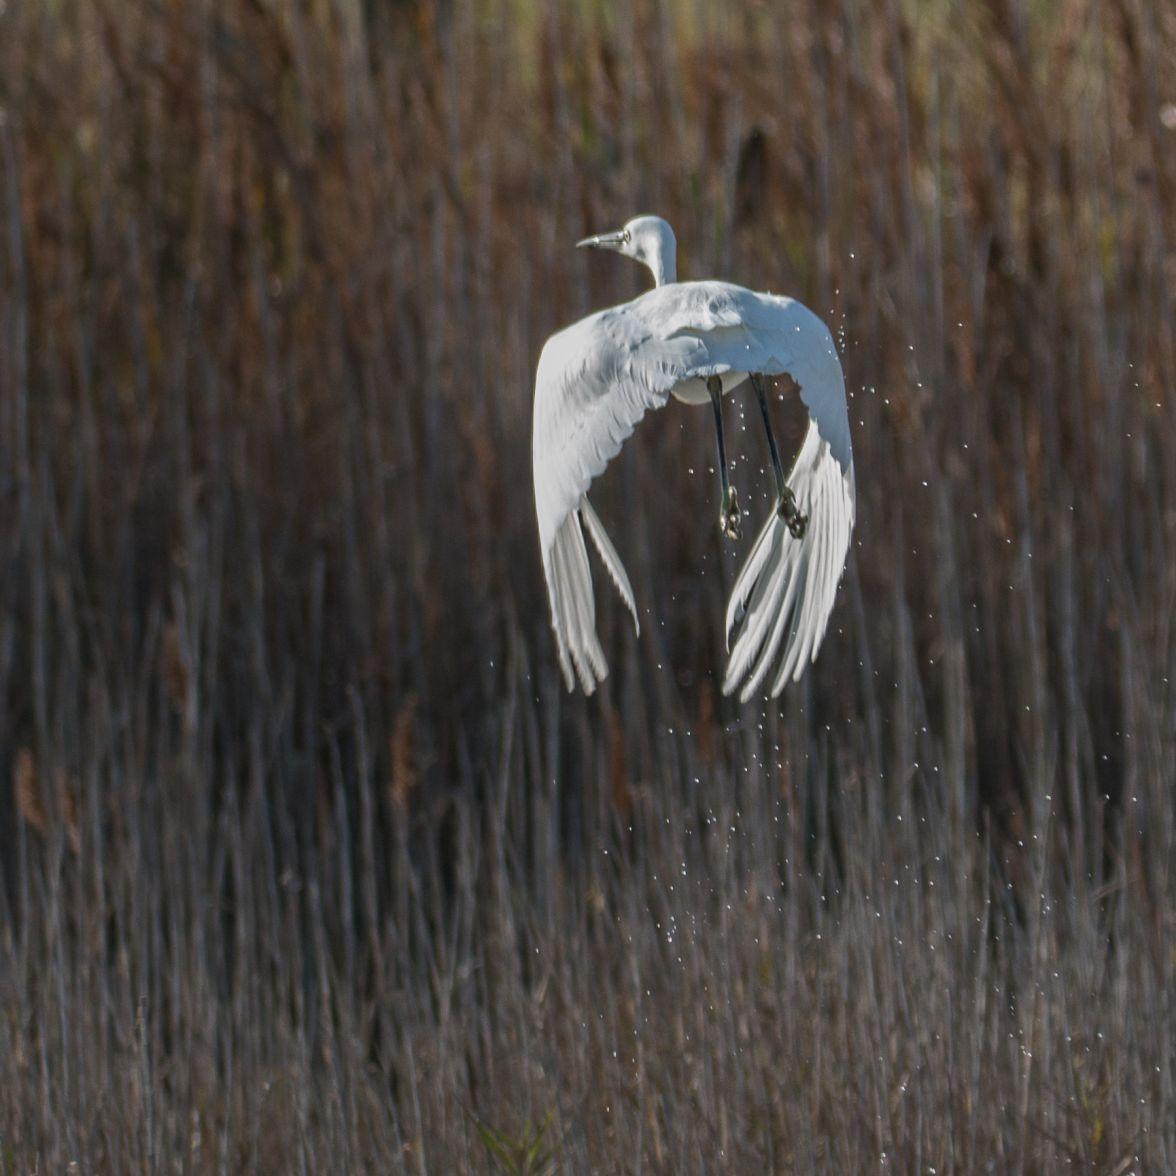 Escaping little egret